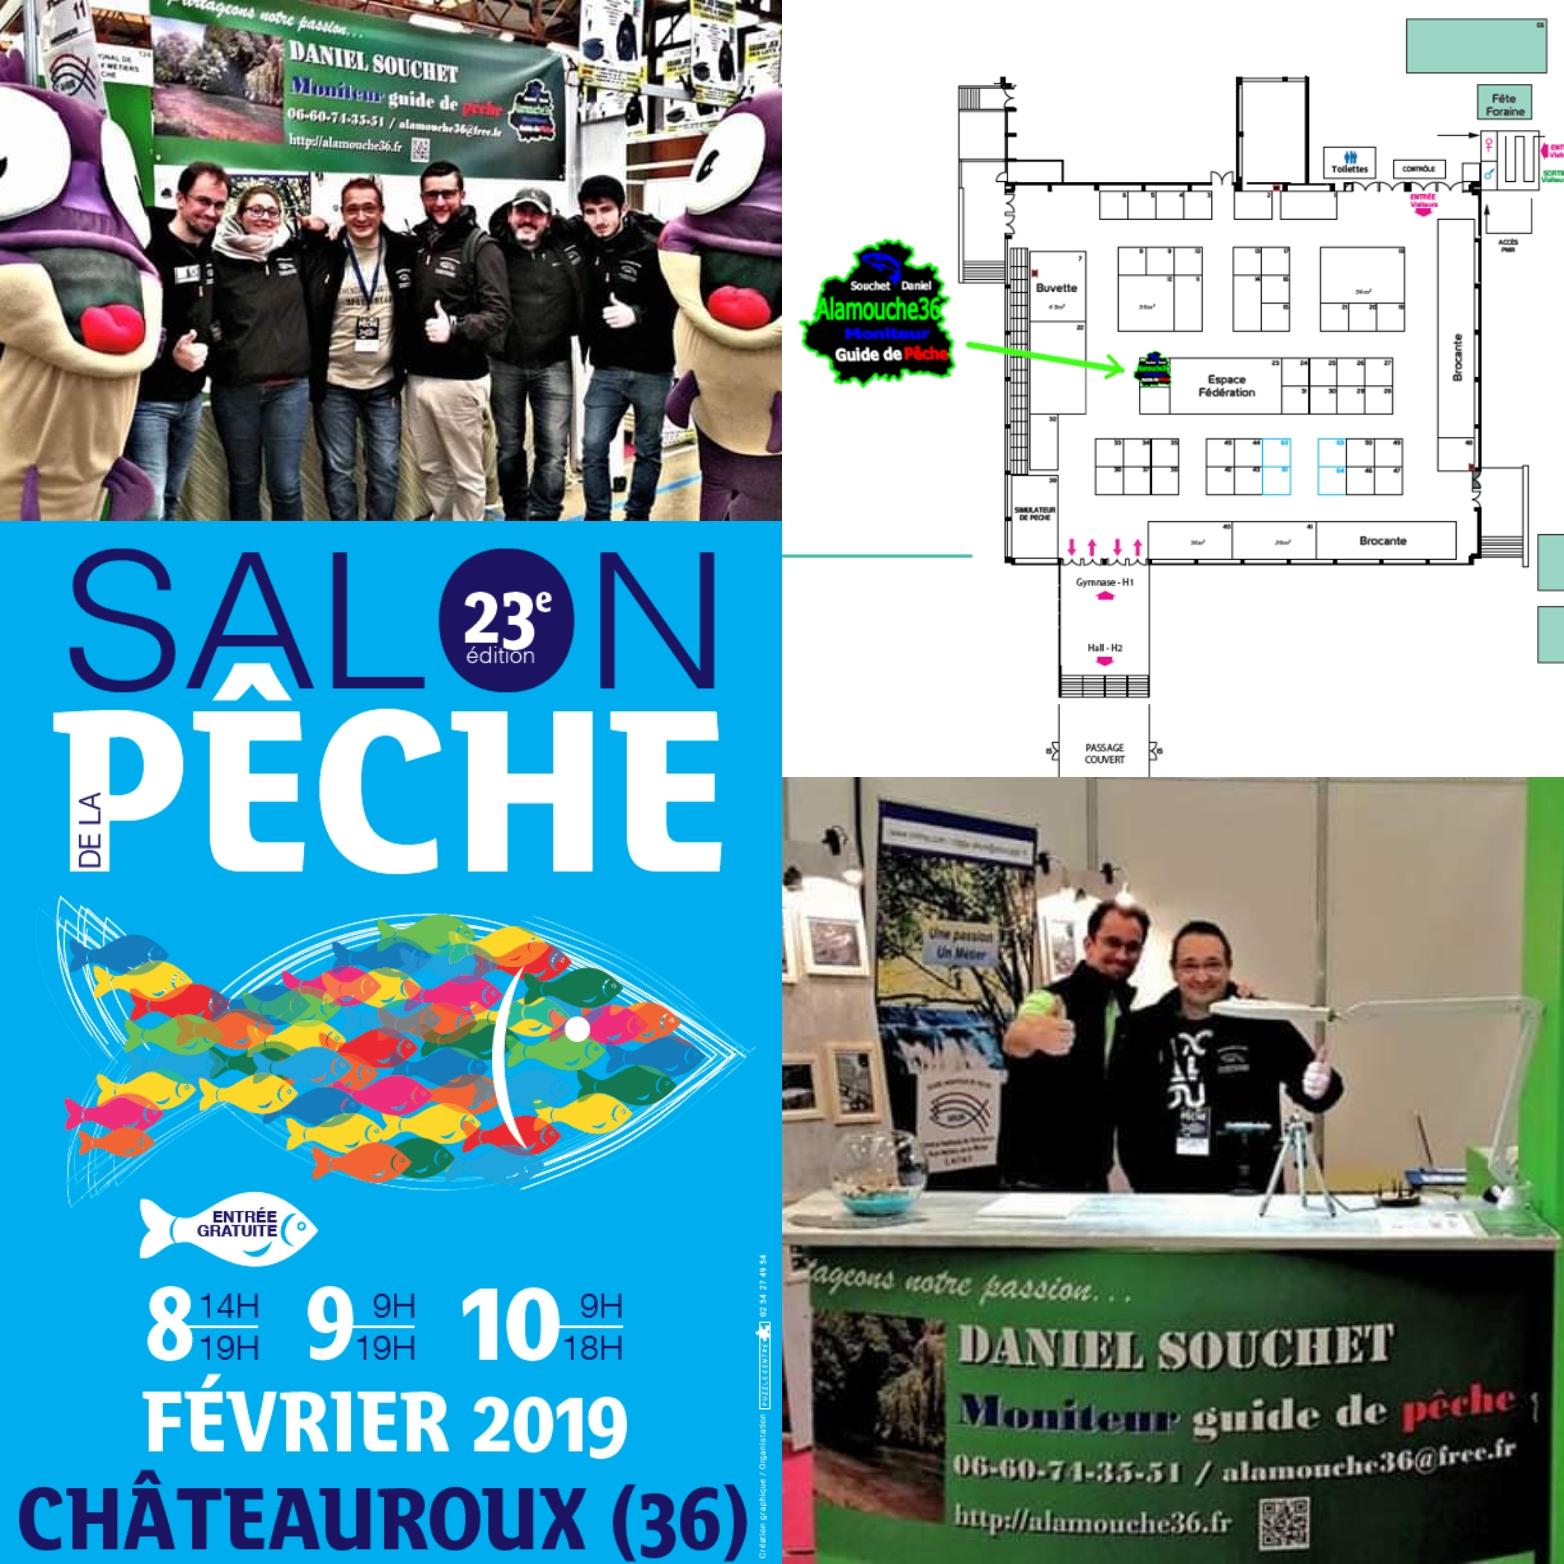 alamouche36 moniteur guide peche salon chateauroux